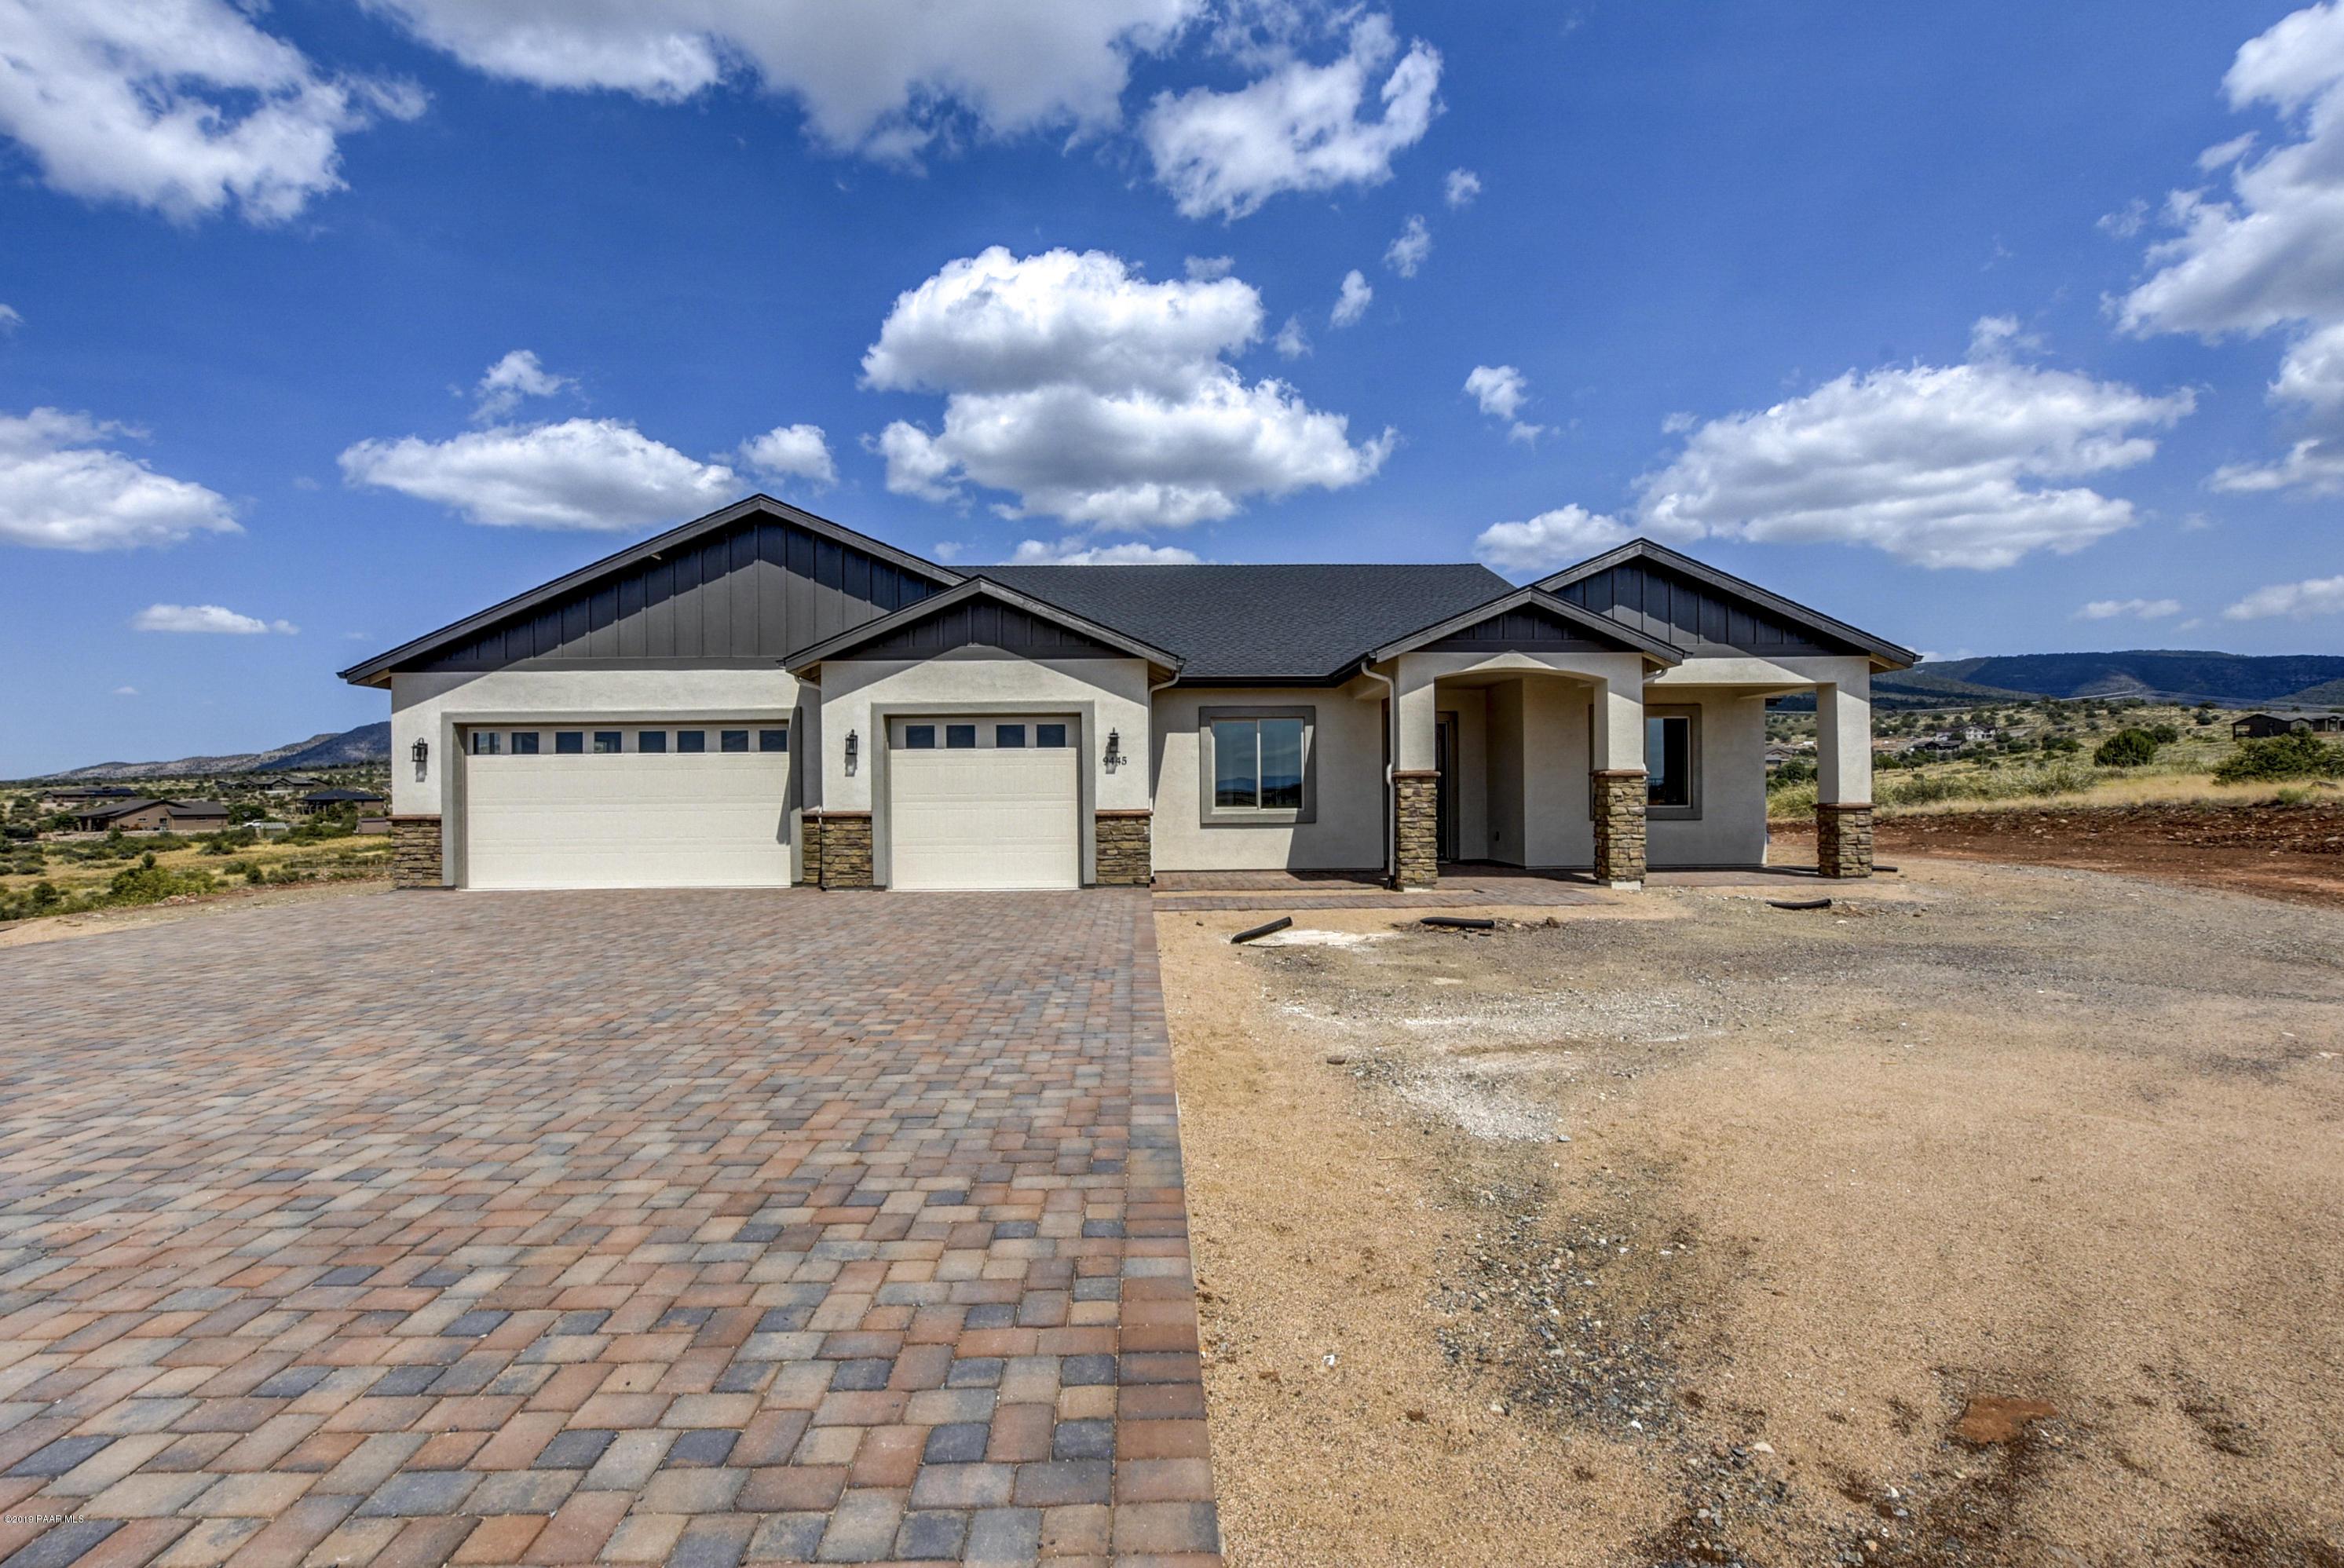 Photo of 9445 Bliss, Prescott Valley, AZ 86315